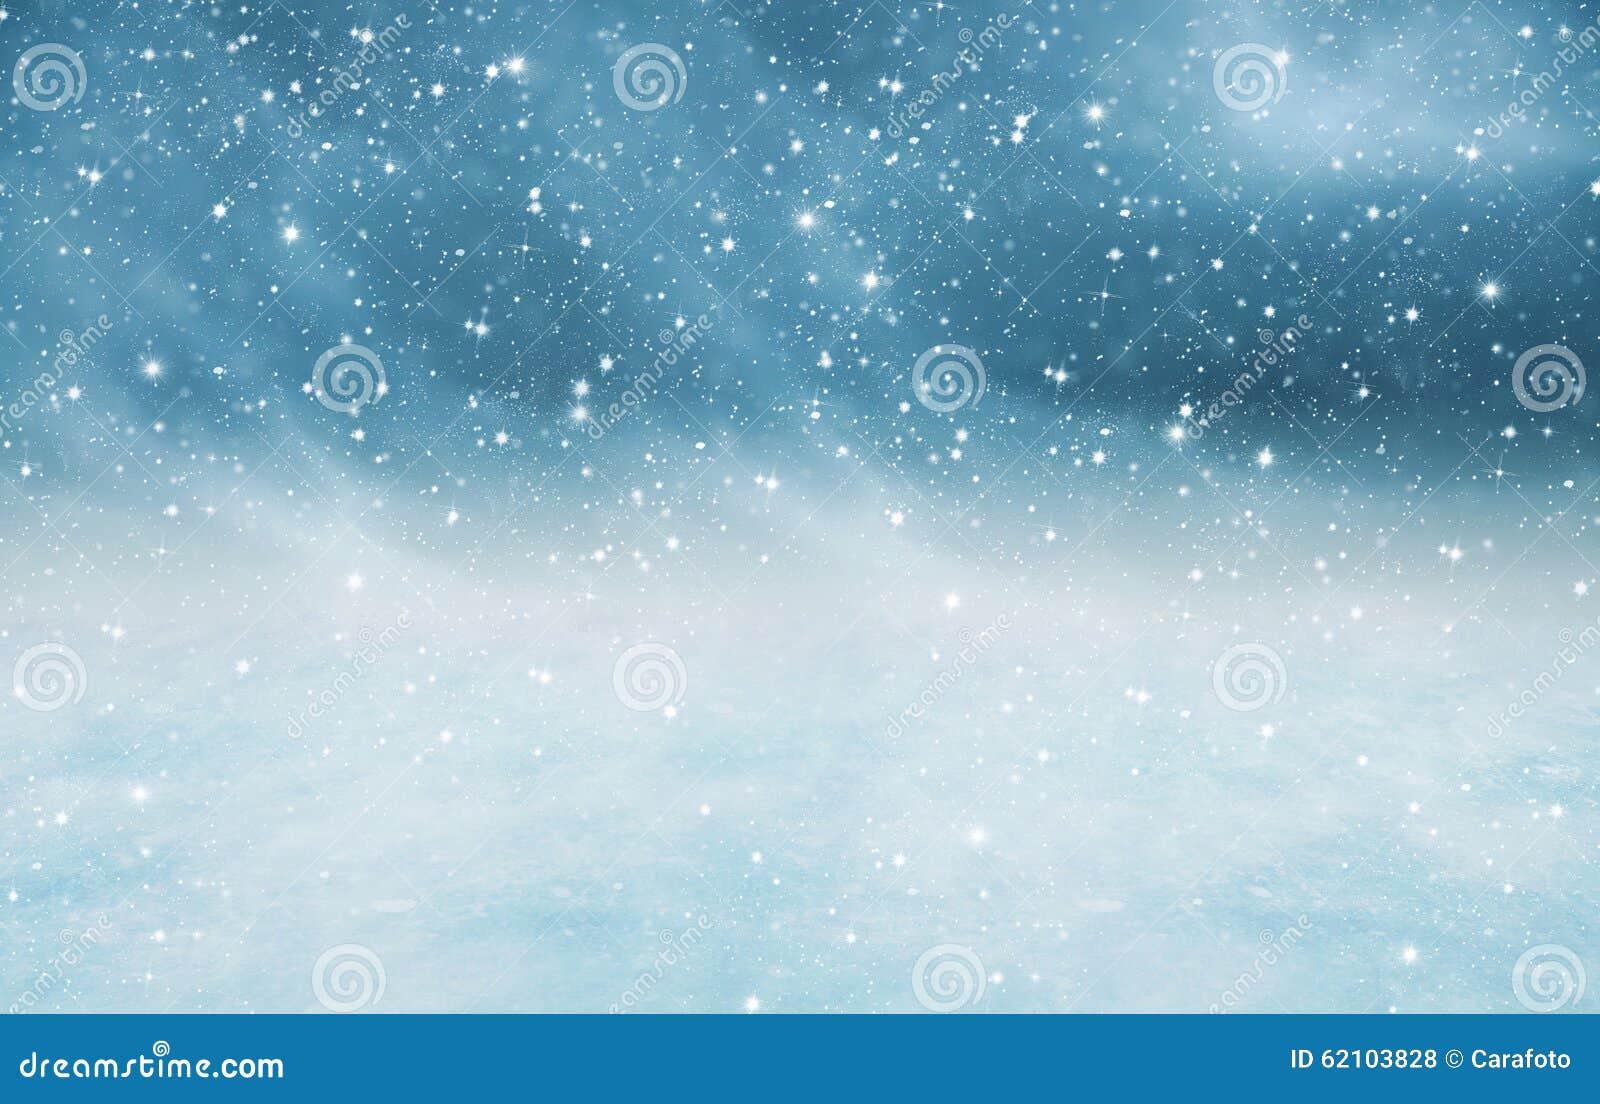 Sneeuwlandschapstextuur